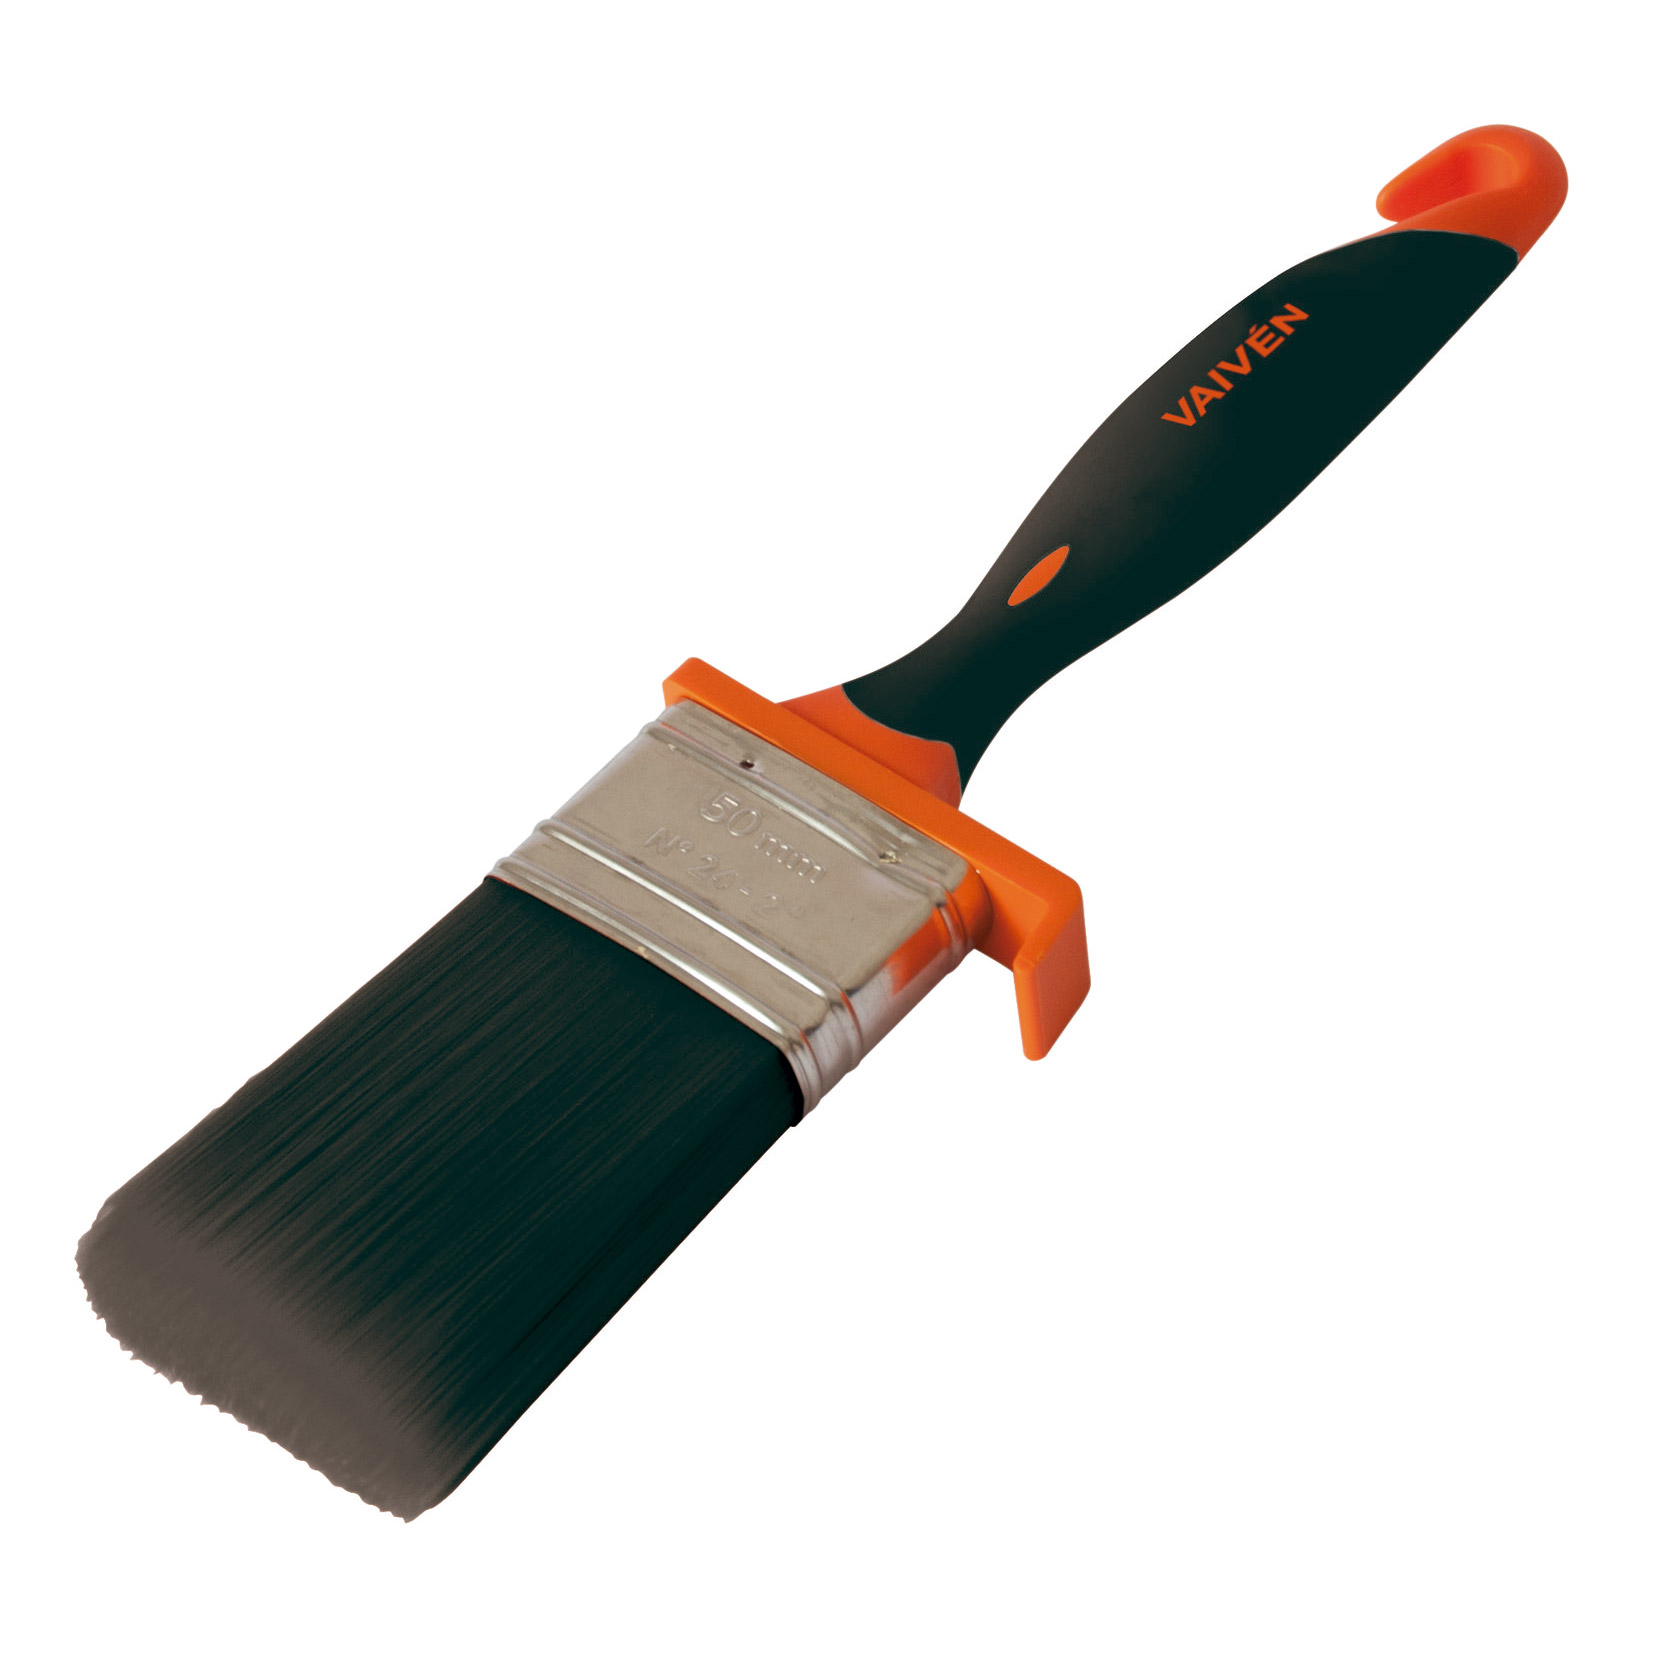 Кисть-флейц Vaiven rendix трехкомпонентная 40мм